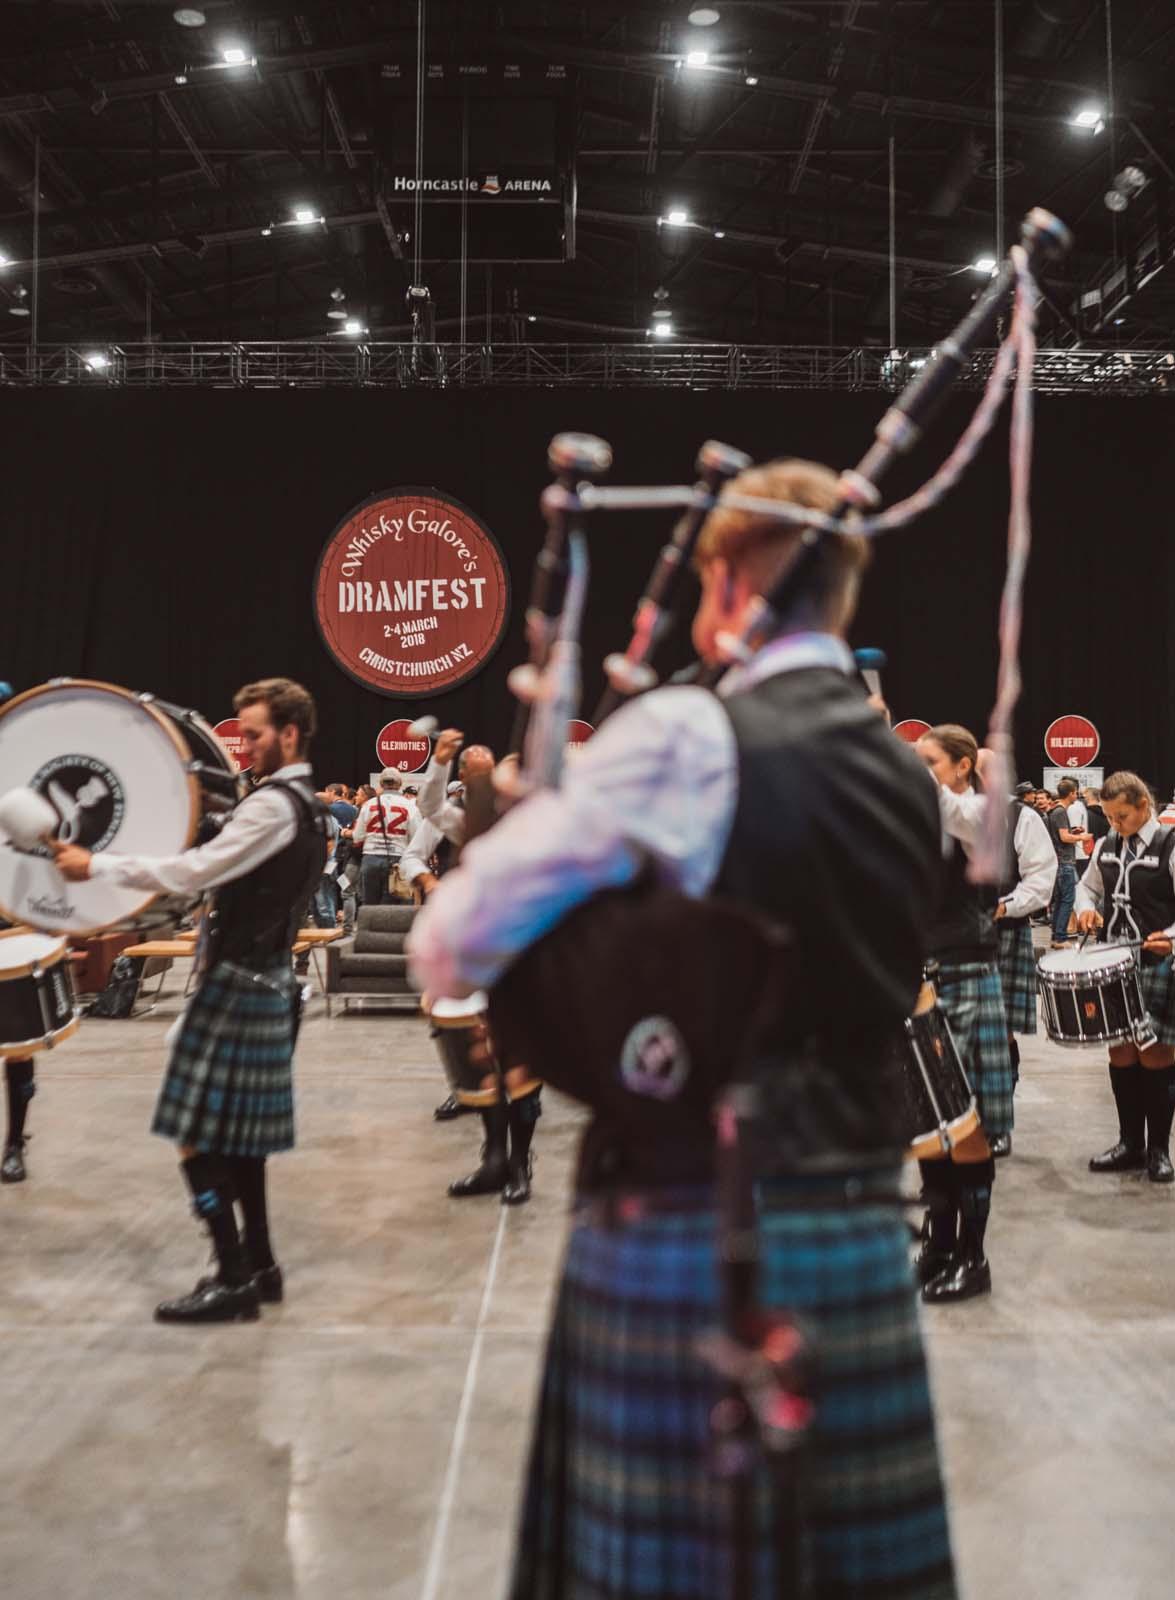 Dramfest 2018 for Whisky Galore-407.jpg